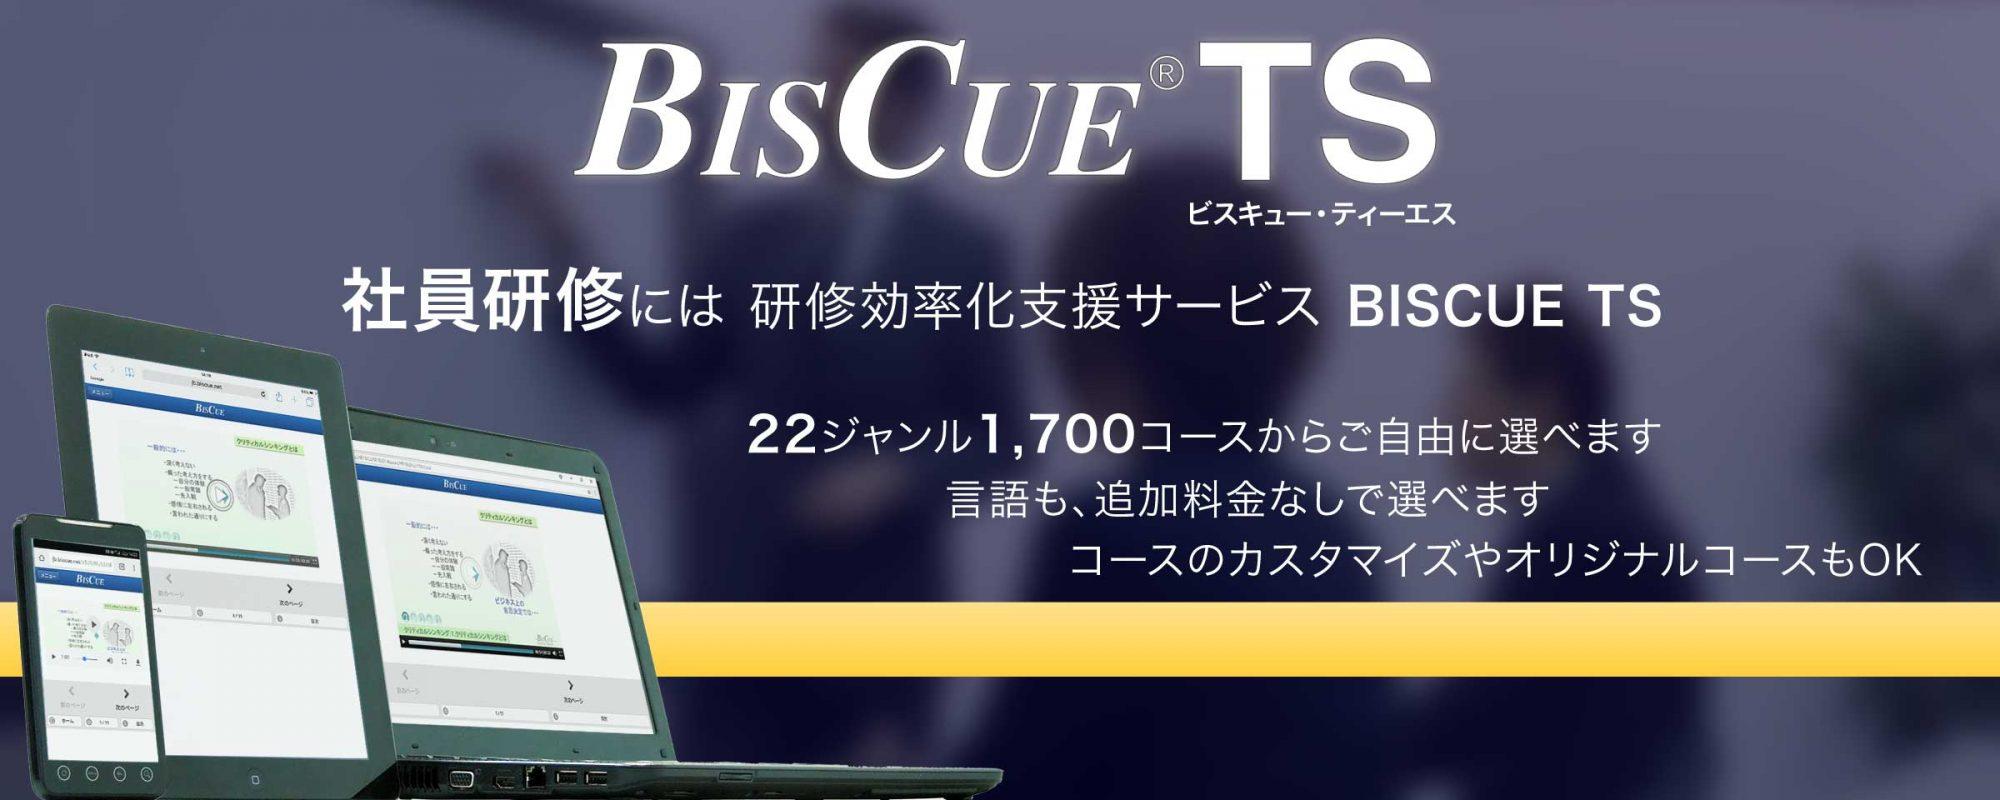 BISCUE TS 社員研修には研修効率化支援サービス